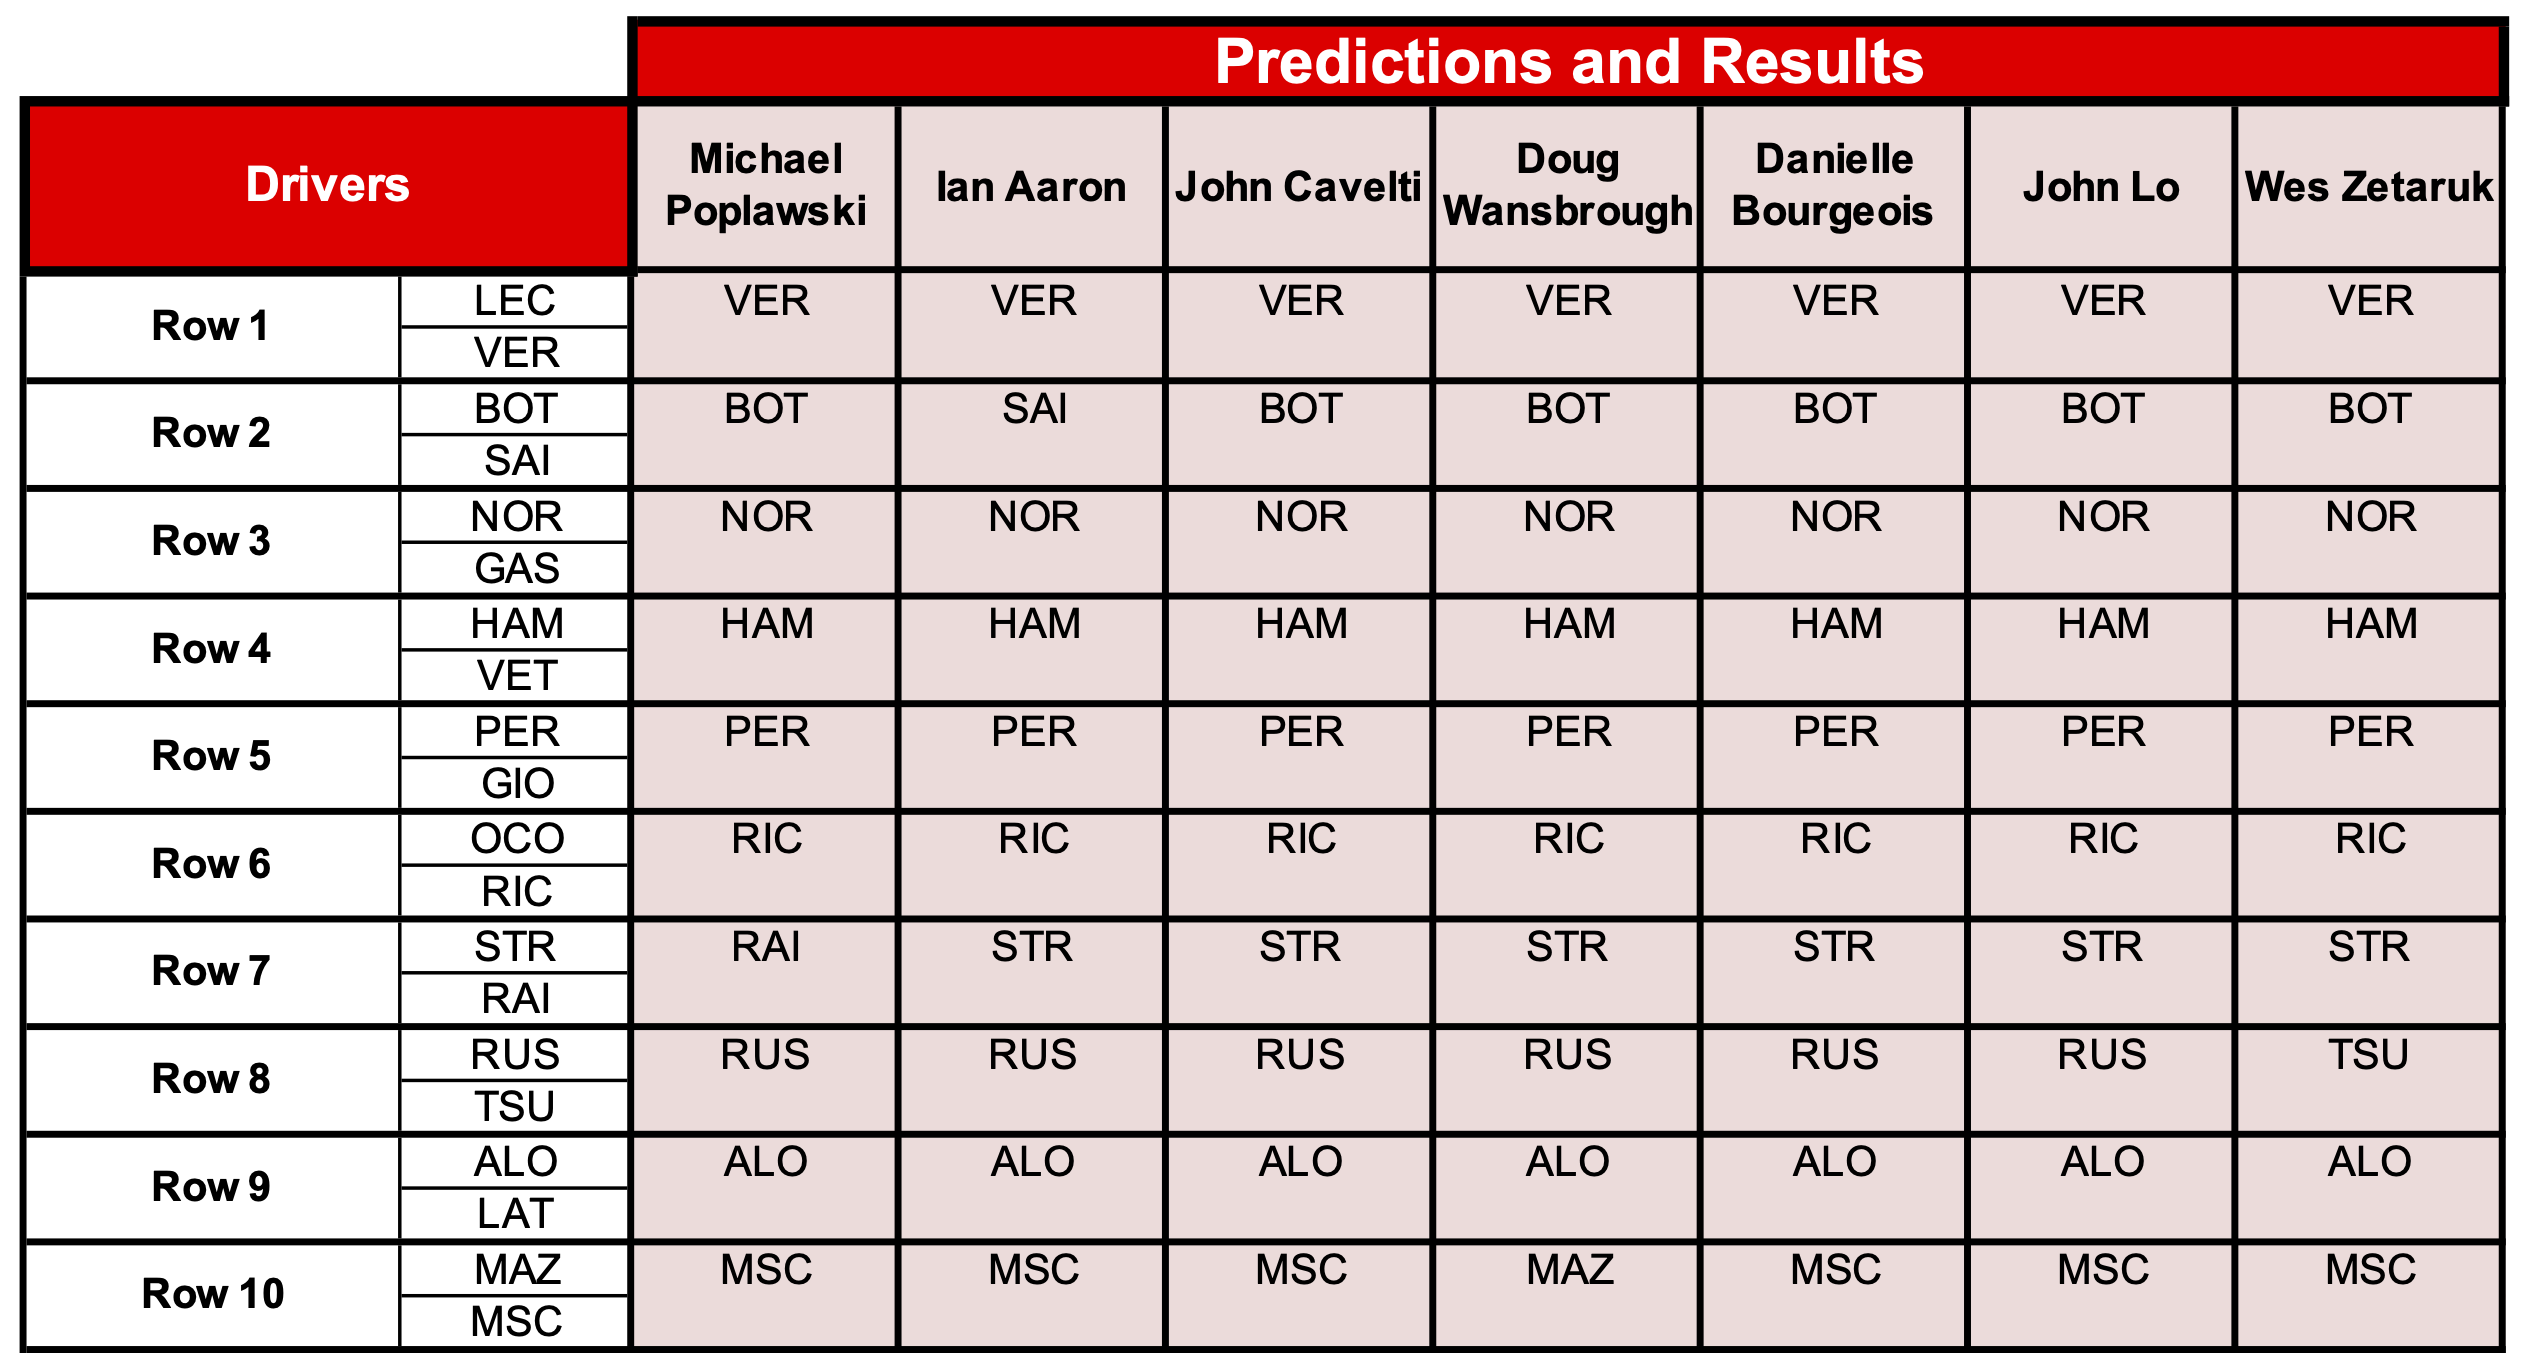 5 Predictions